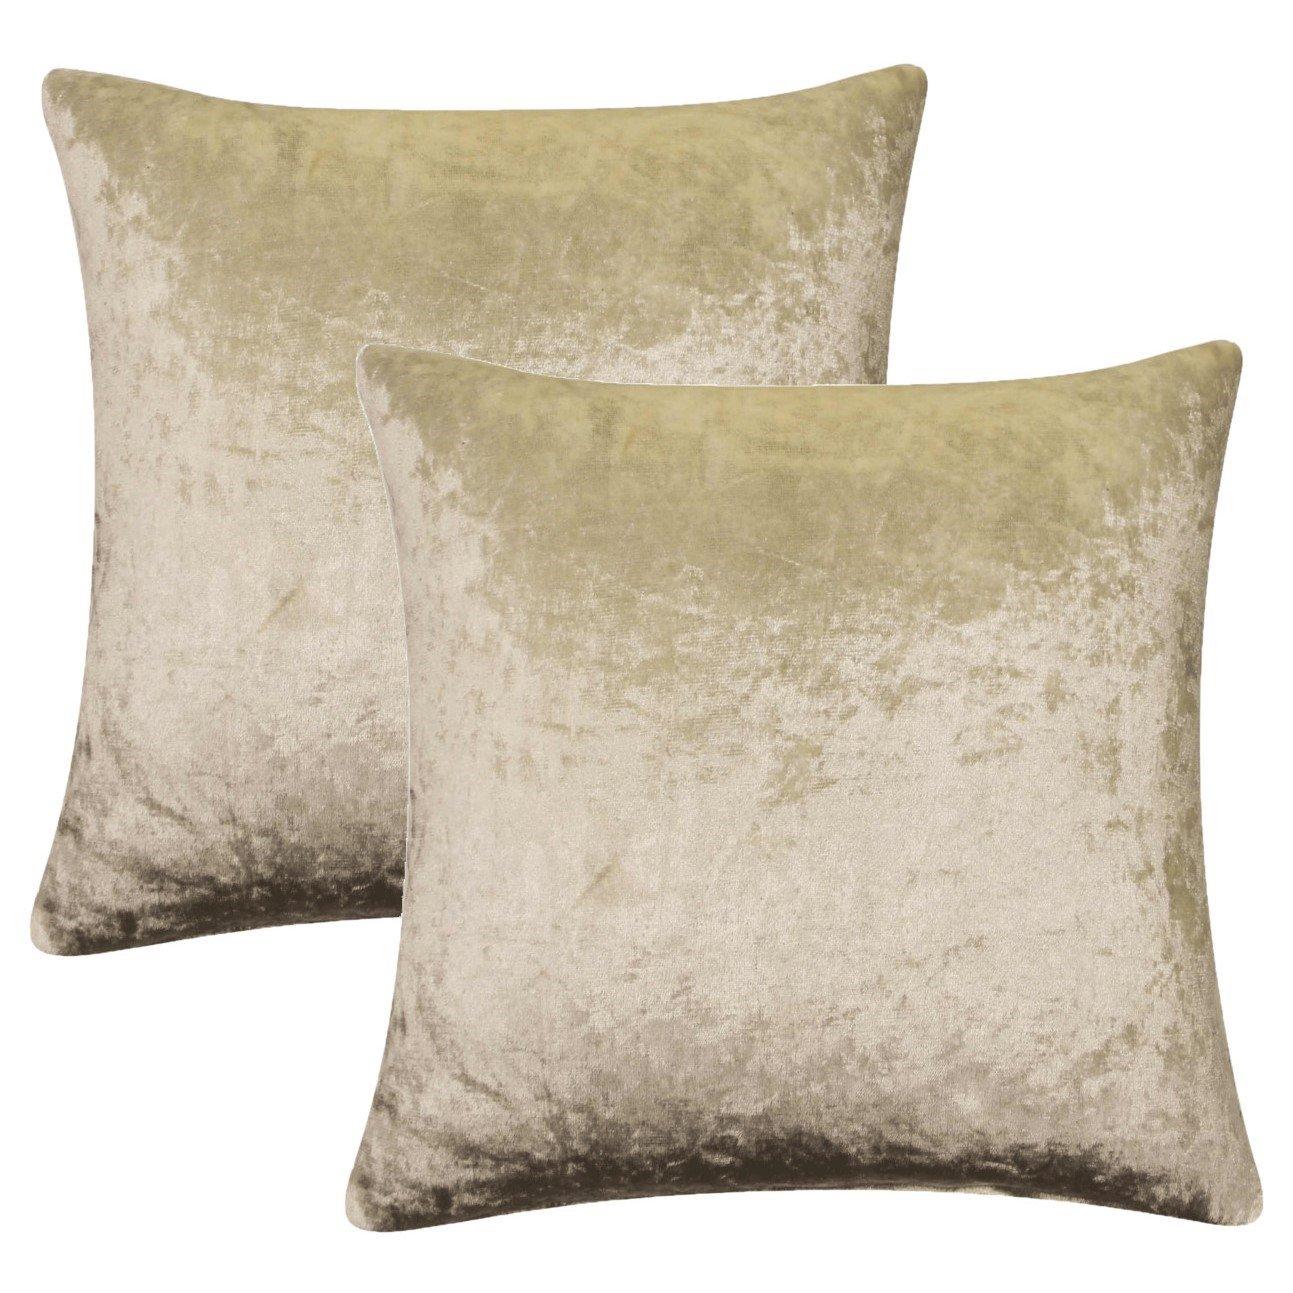 scatter cushion covers. Black Bedroom Furniture Sets. Home Design Ideas